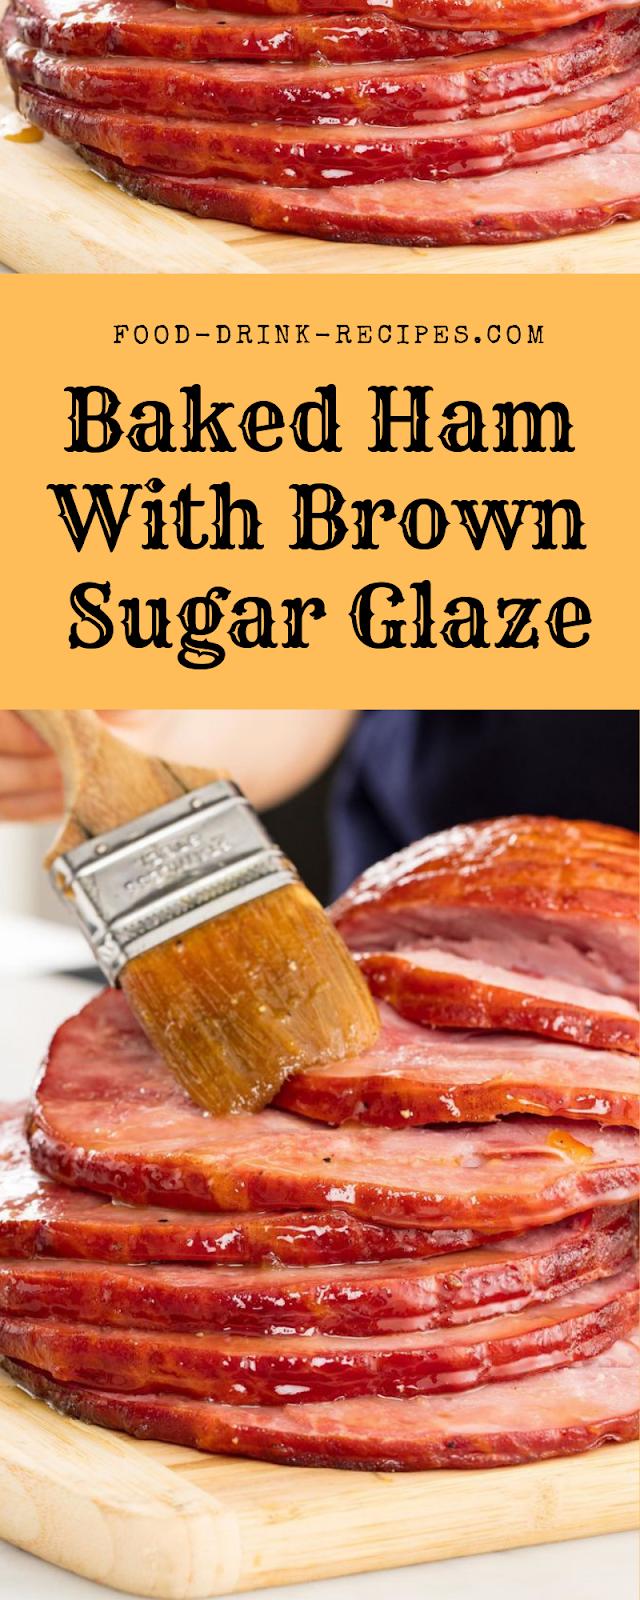 Baked Ham With Brown Sugar Glaze - food-drink-recipes.com